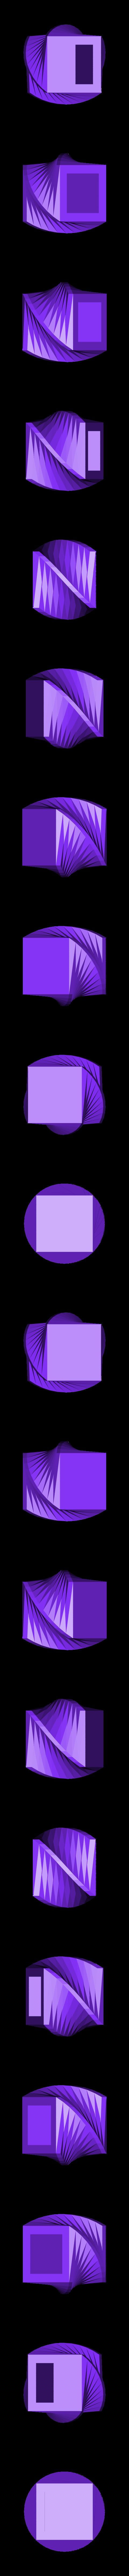 pot.stl Download free STL file flower pot • 3D printer design, Joanix